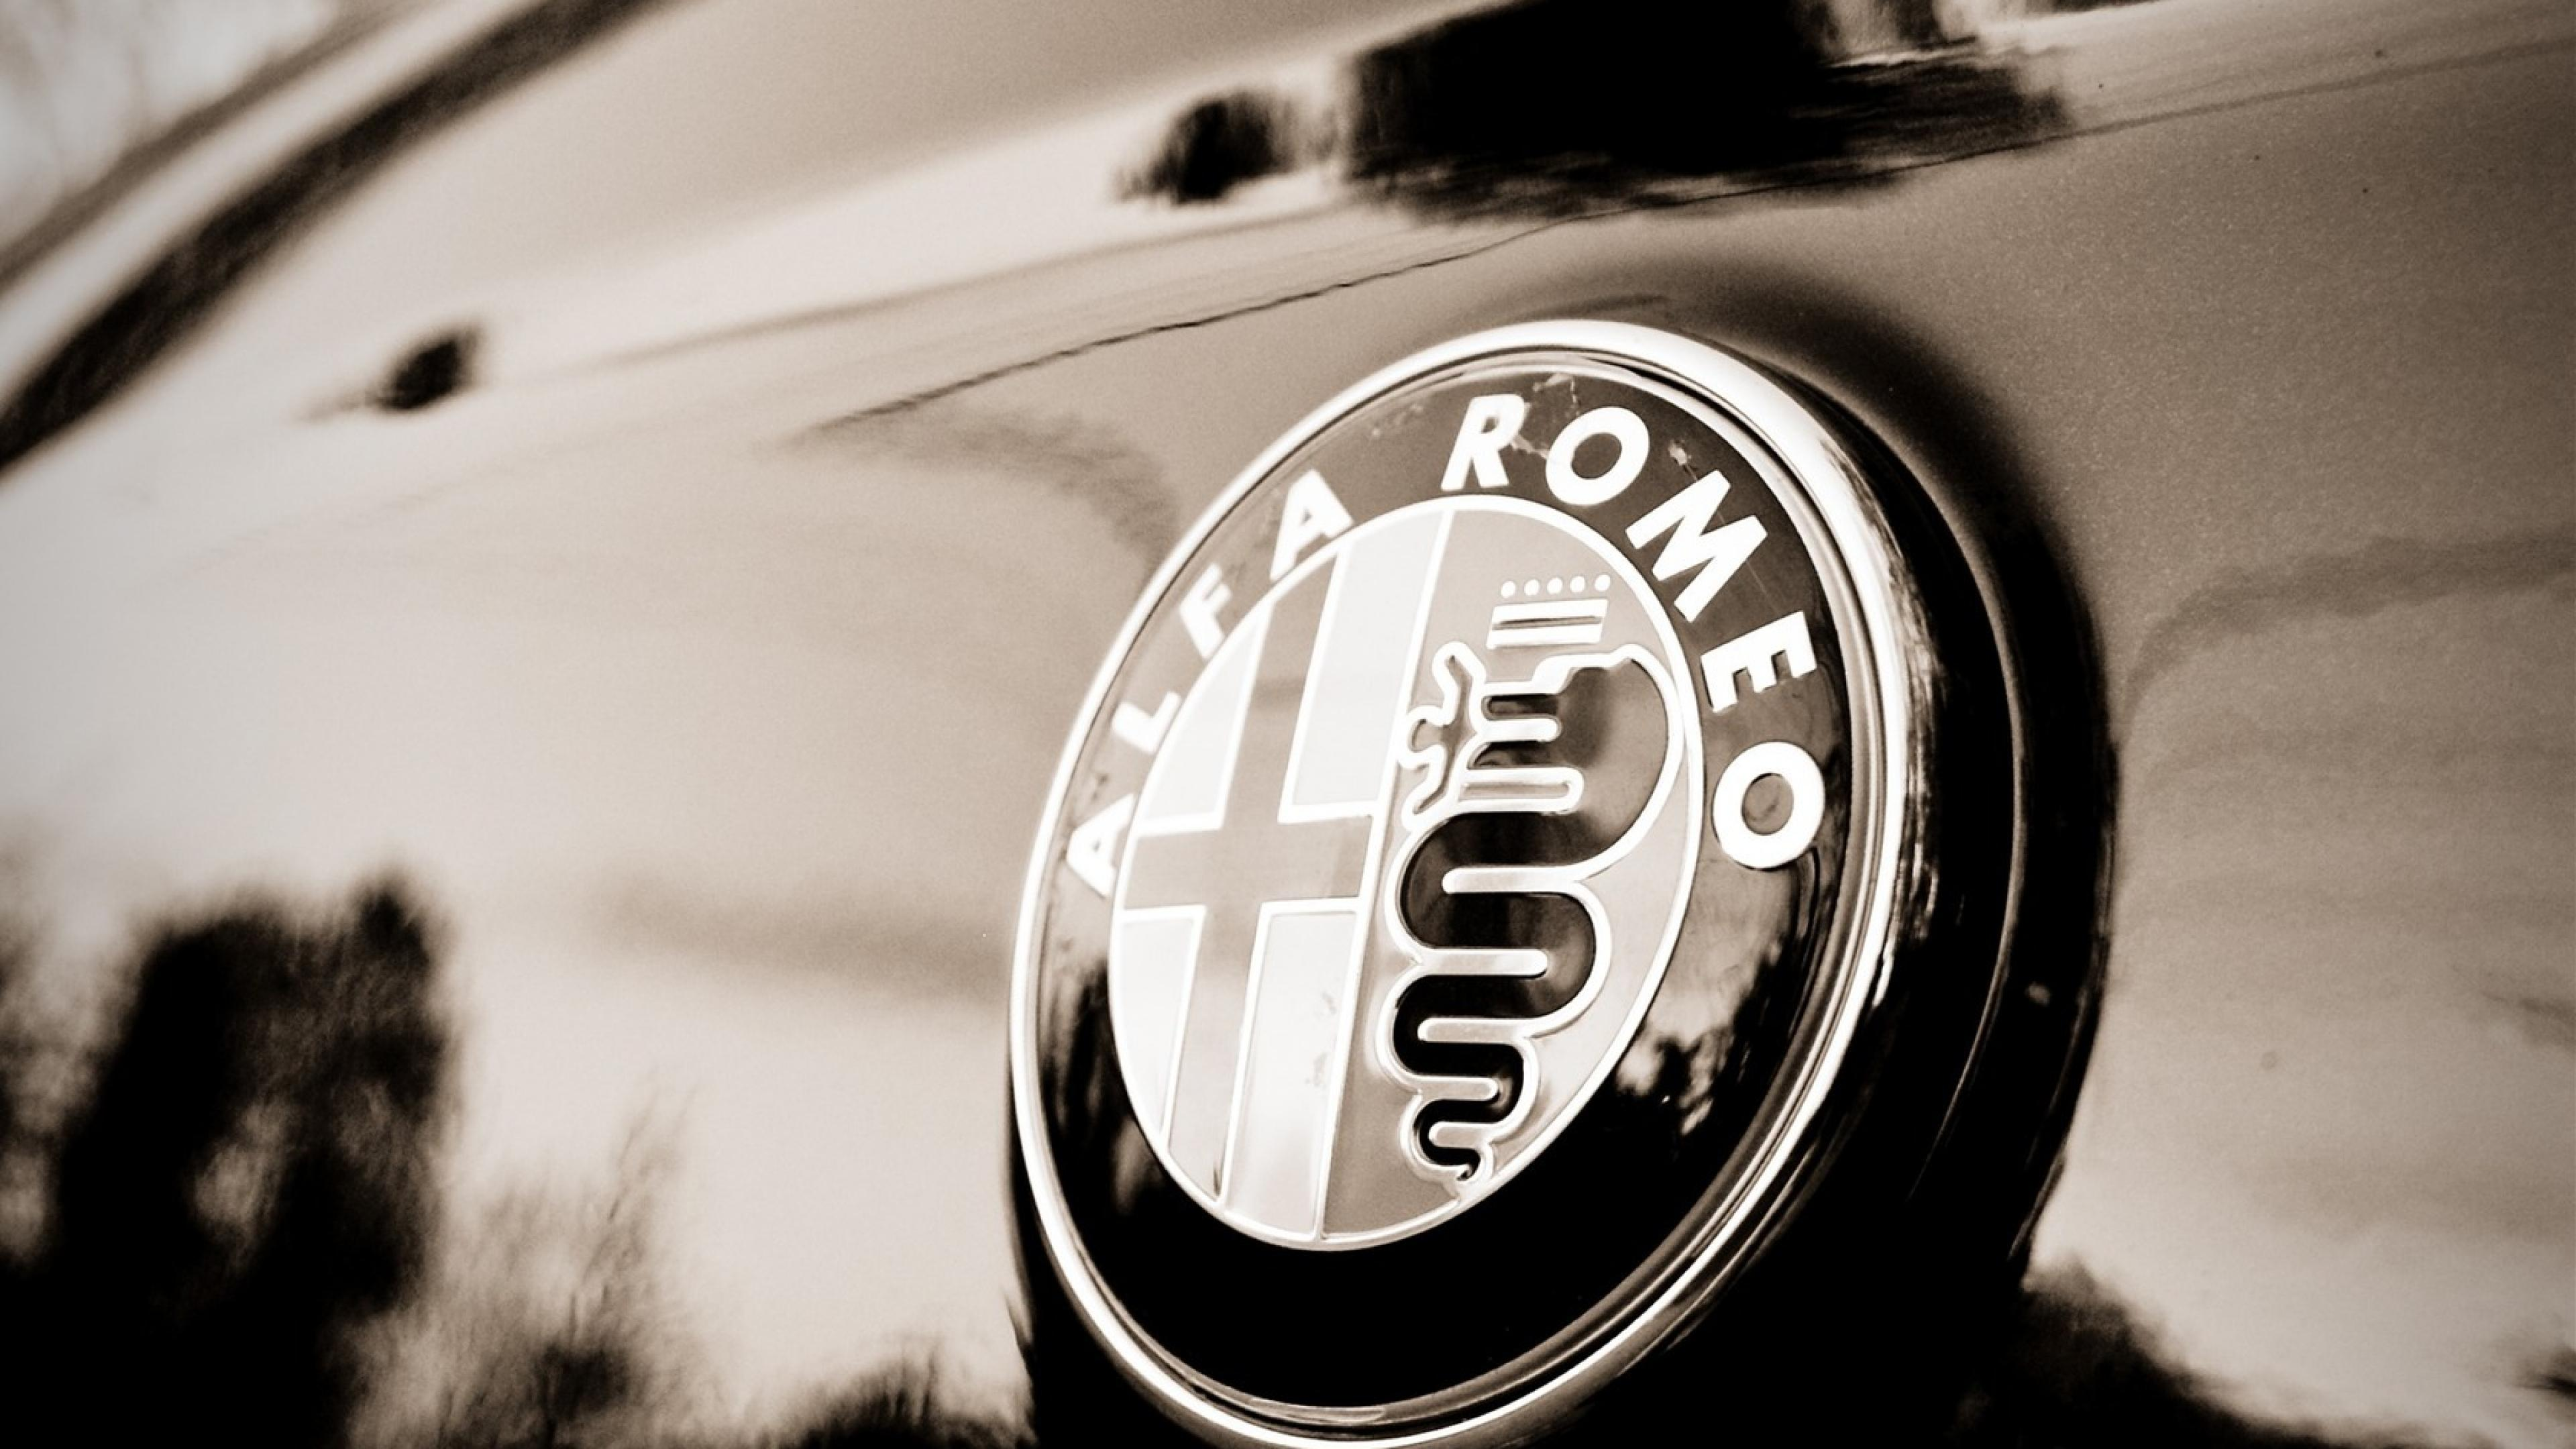 Alfa Romeo Wallpaper 9   3840 X 2160 stmednet 3840x2160